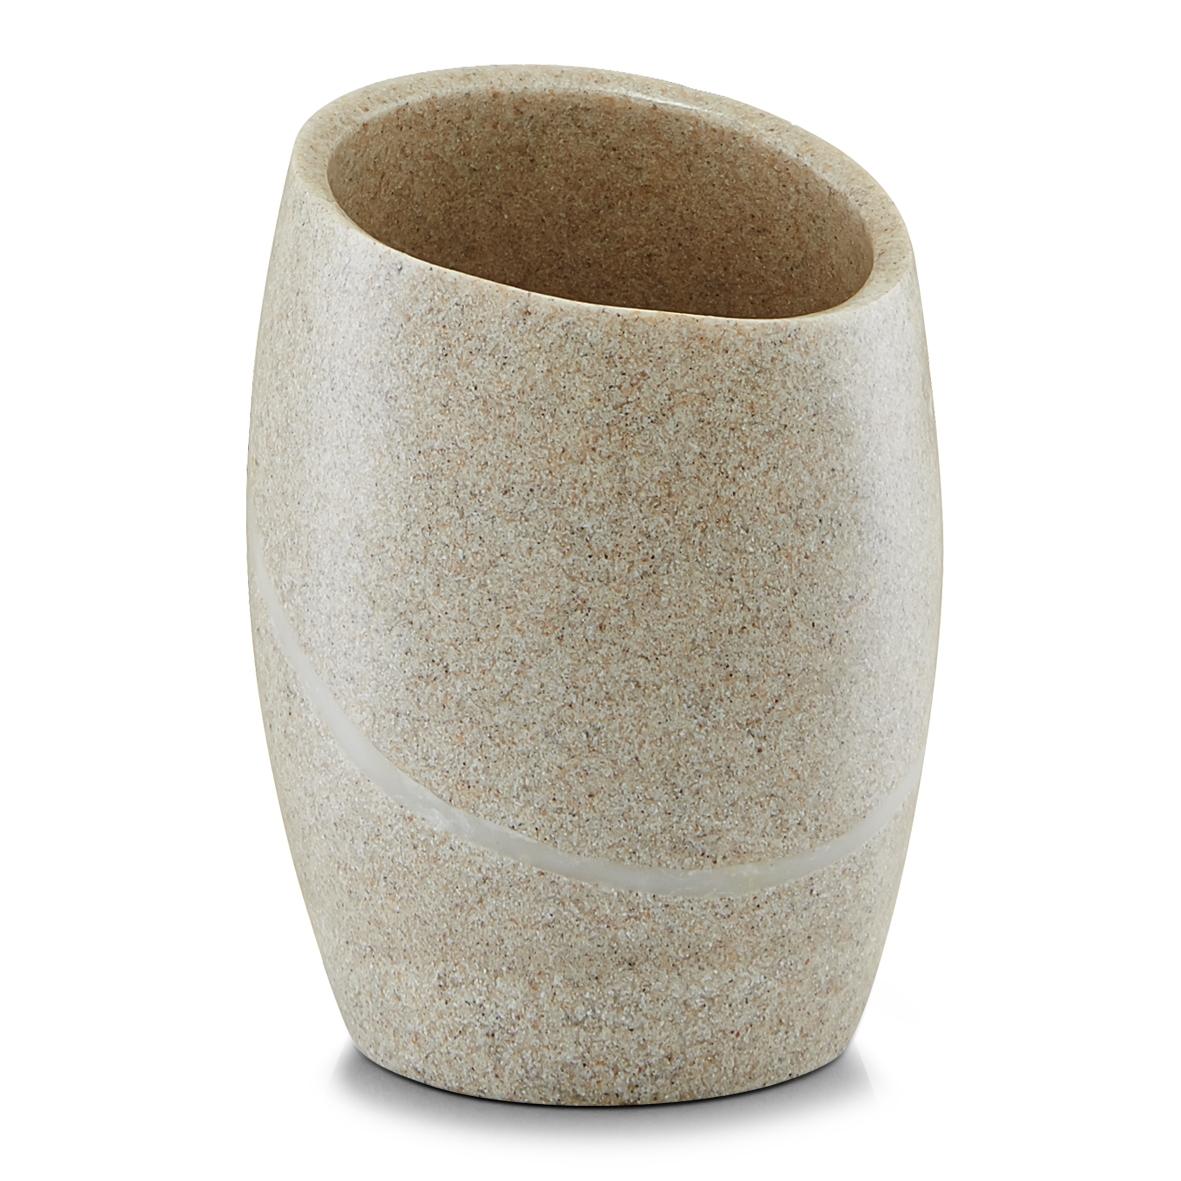 Pahar pentru periuta din polirasina Stonefinish Beige l84xA84xH11 cm